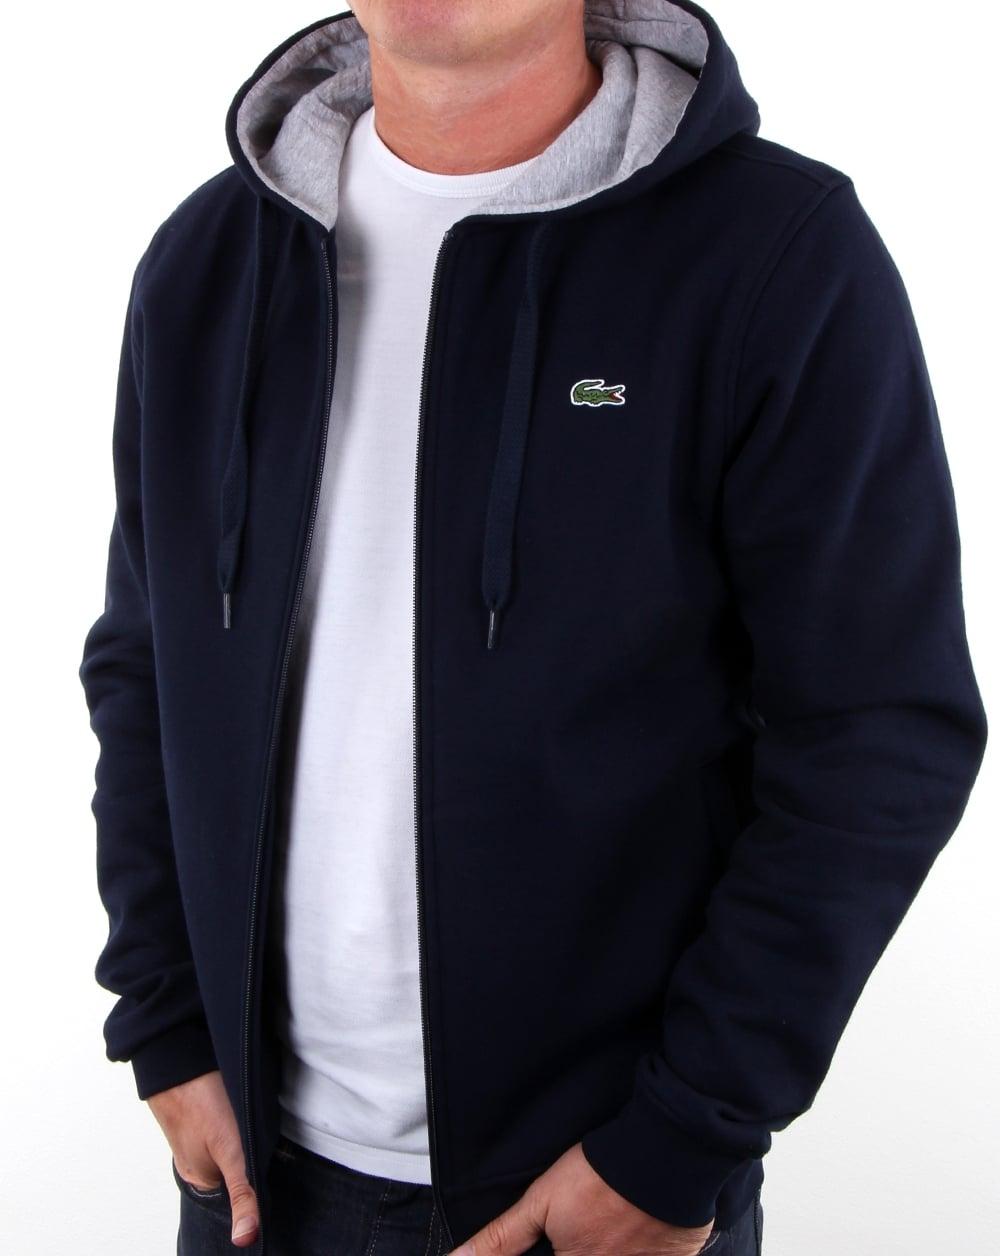 f830e5fdcdc2 Lacoste Hooded Full Zip Sweatshirt Navy